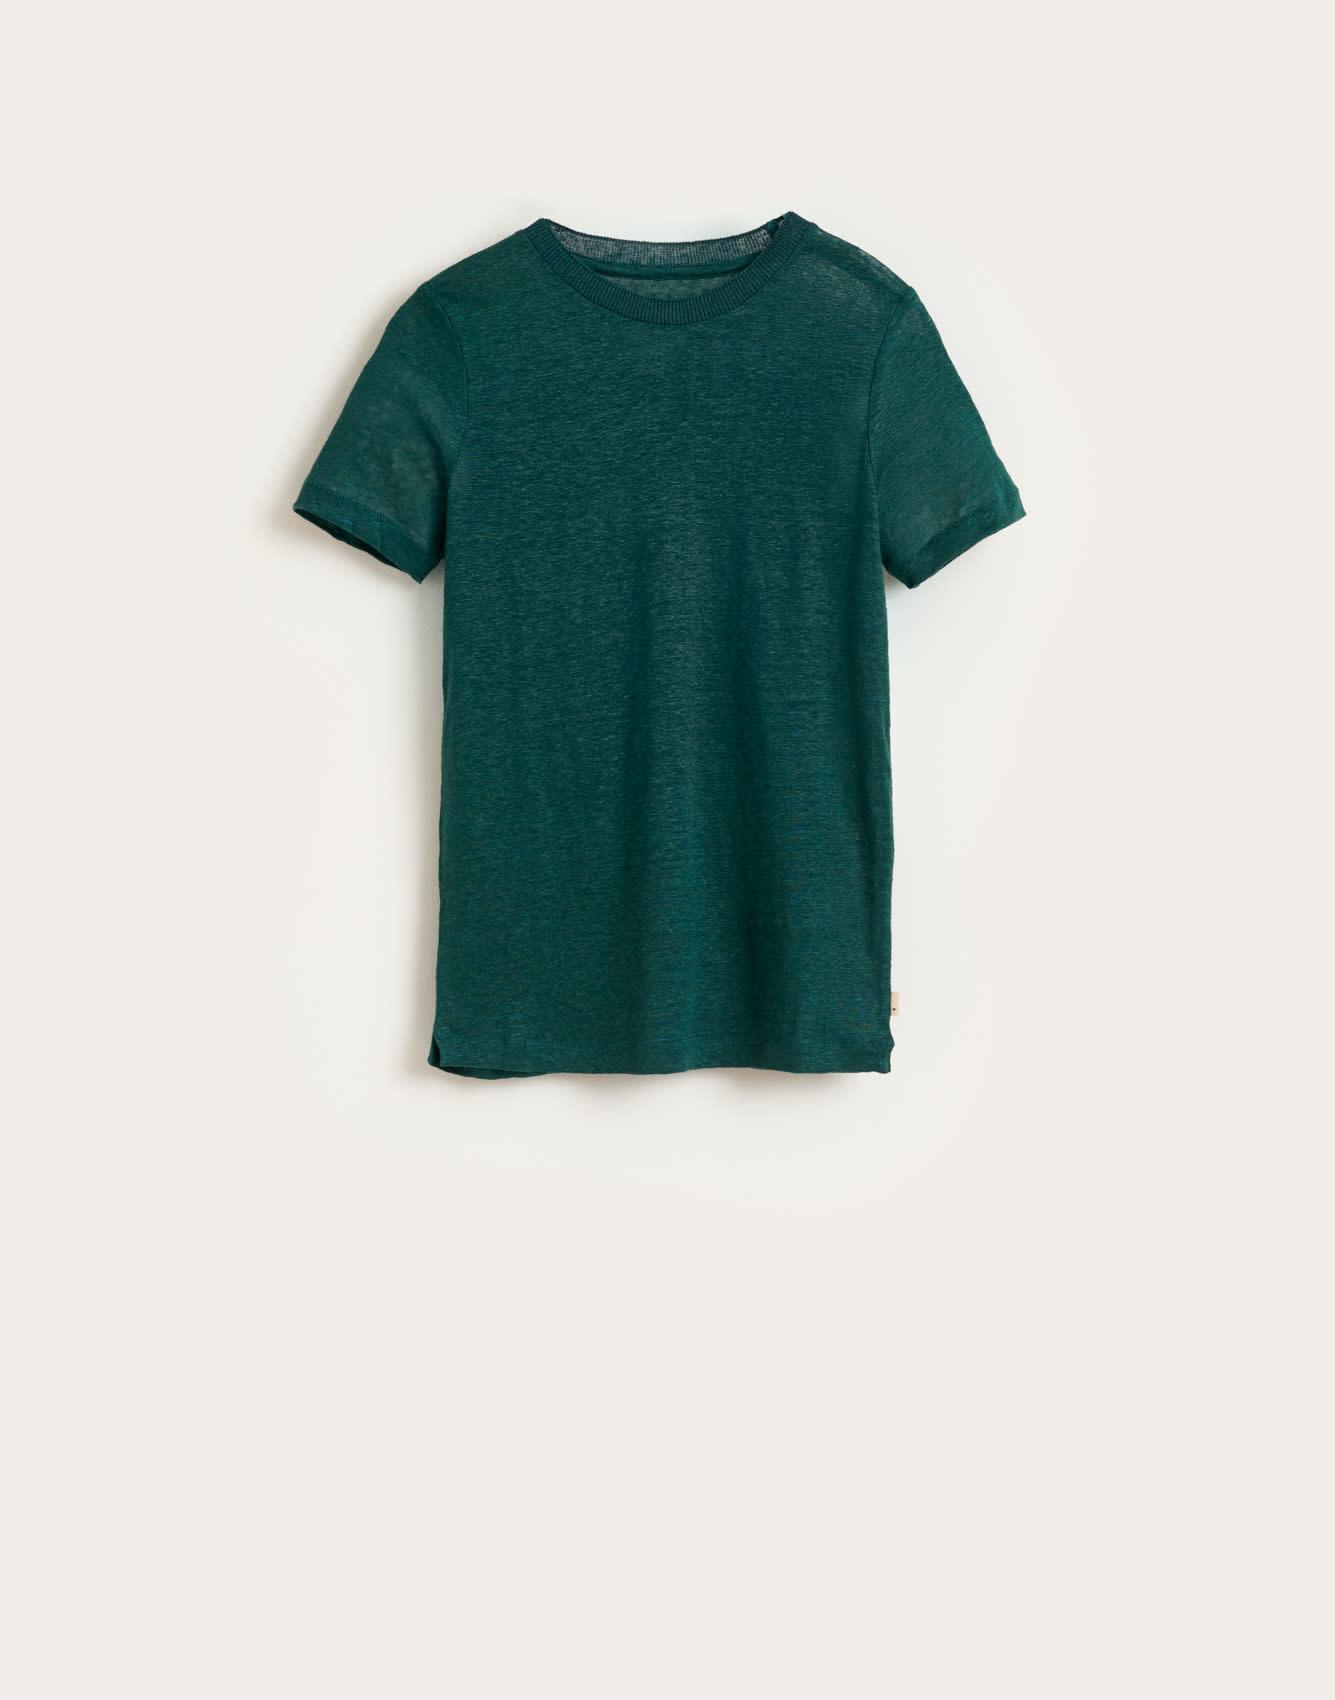 T-shirt pacific-1